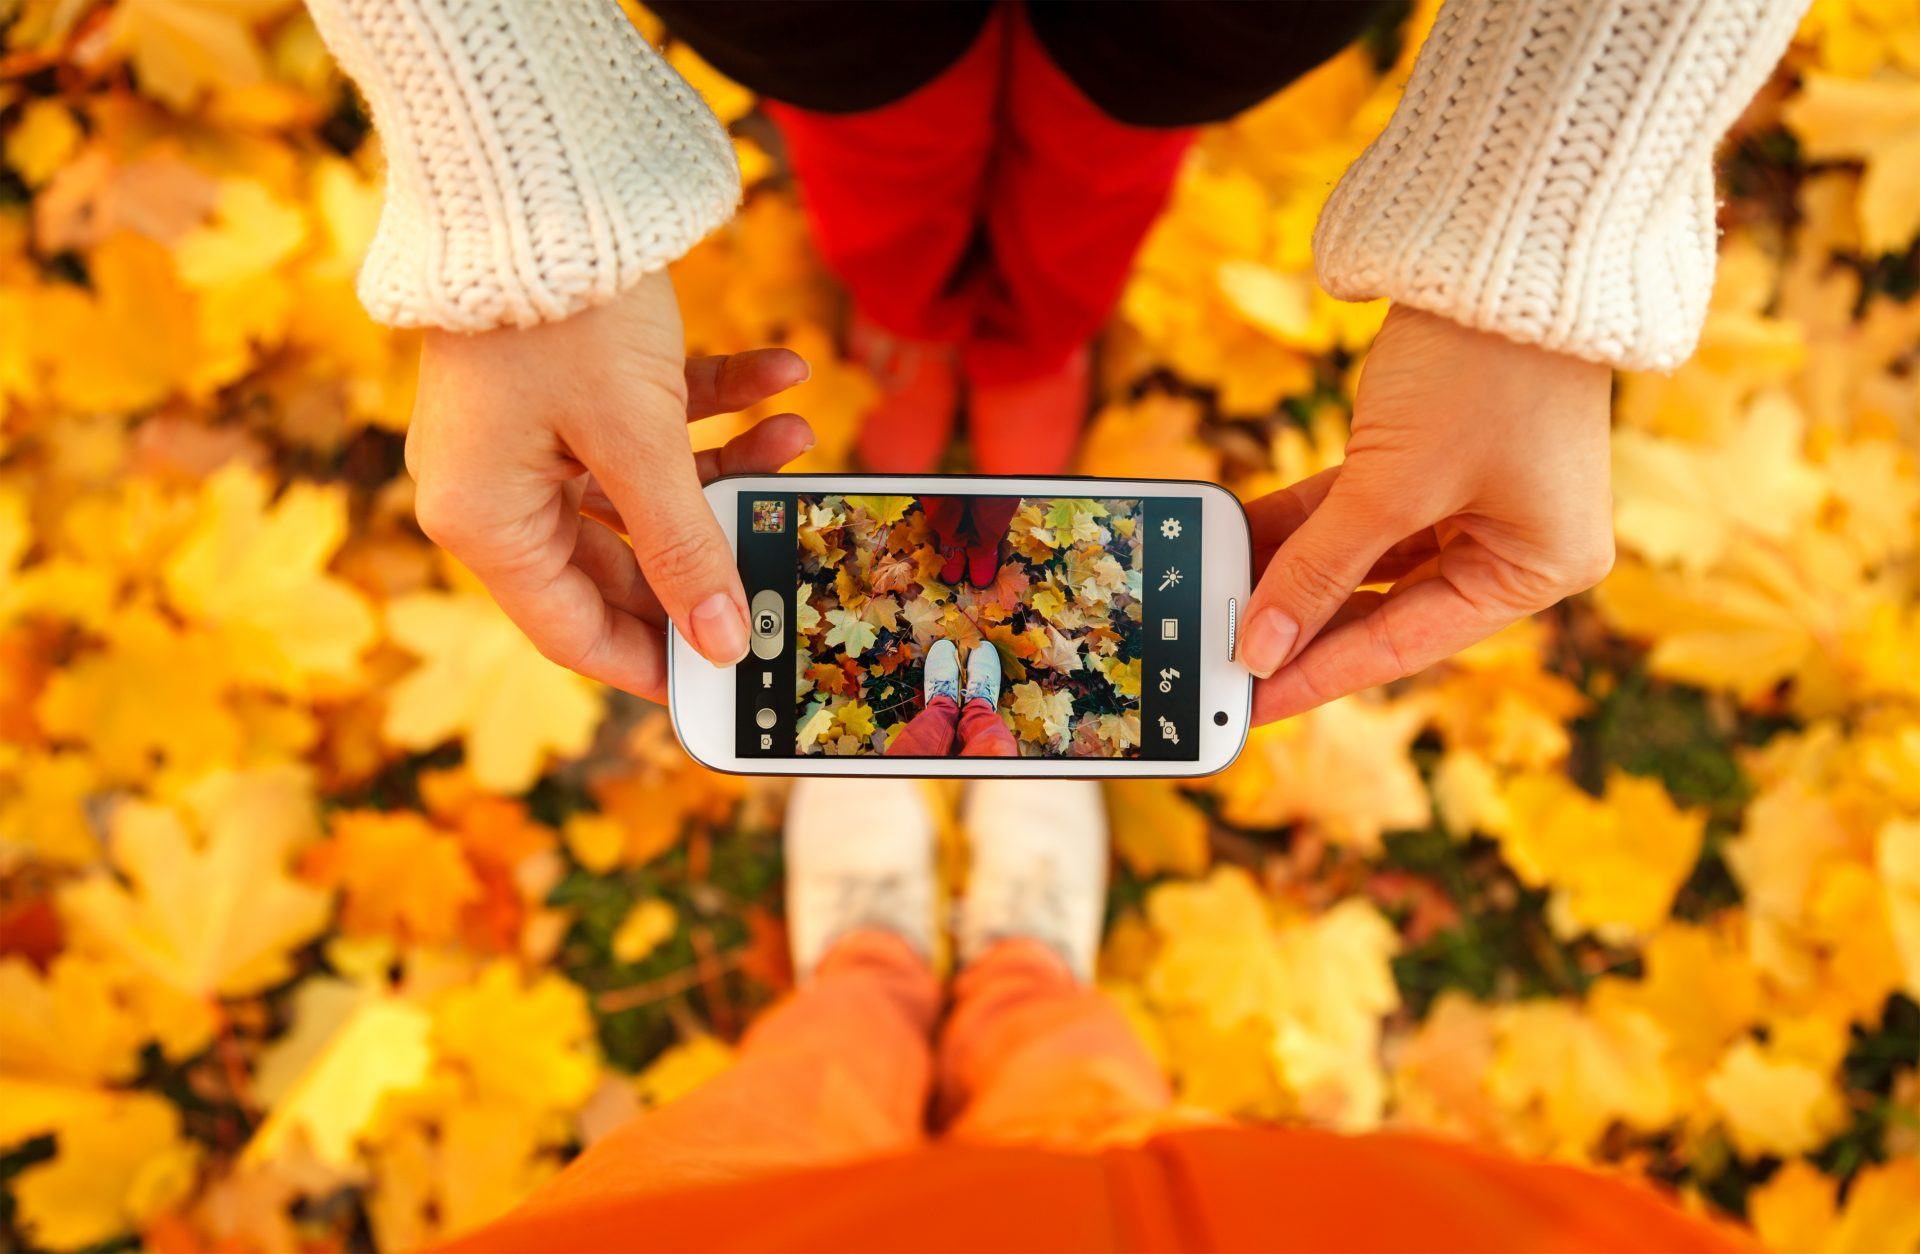 Autumn leaves as seen through smartphone camera